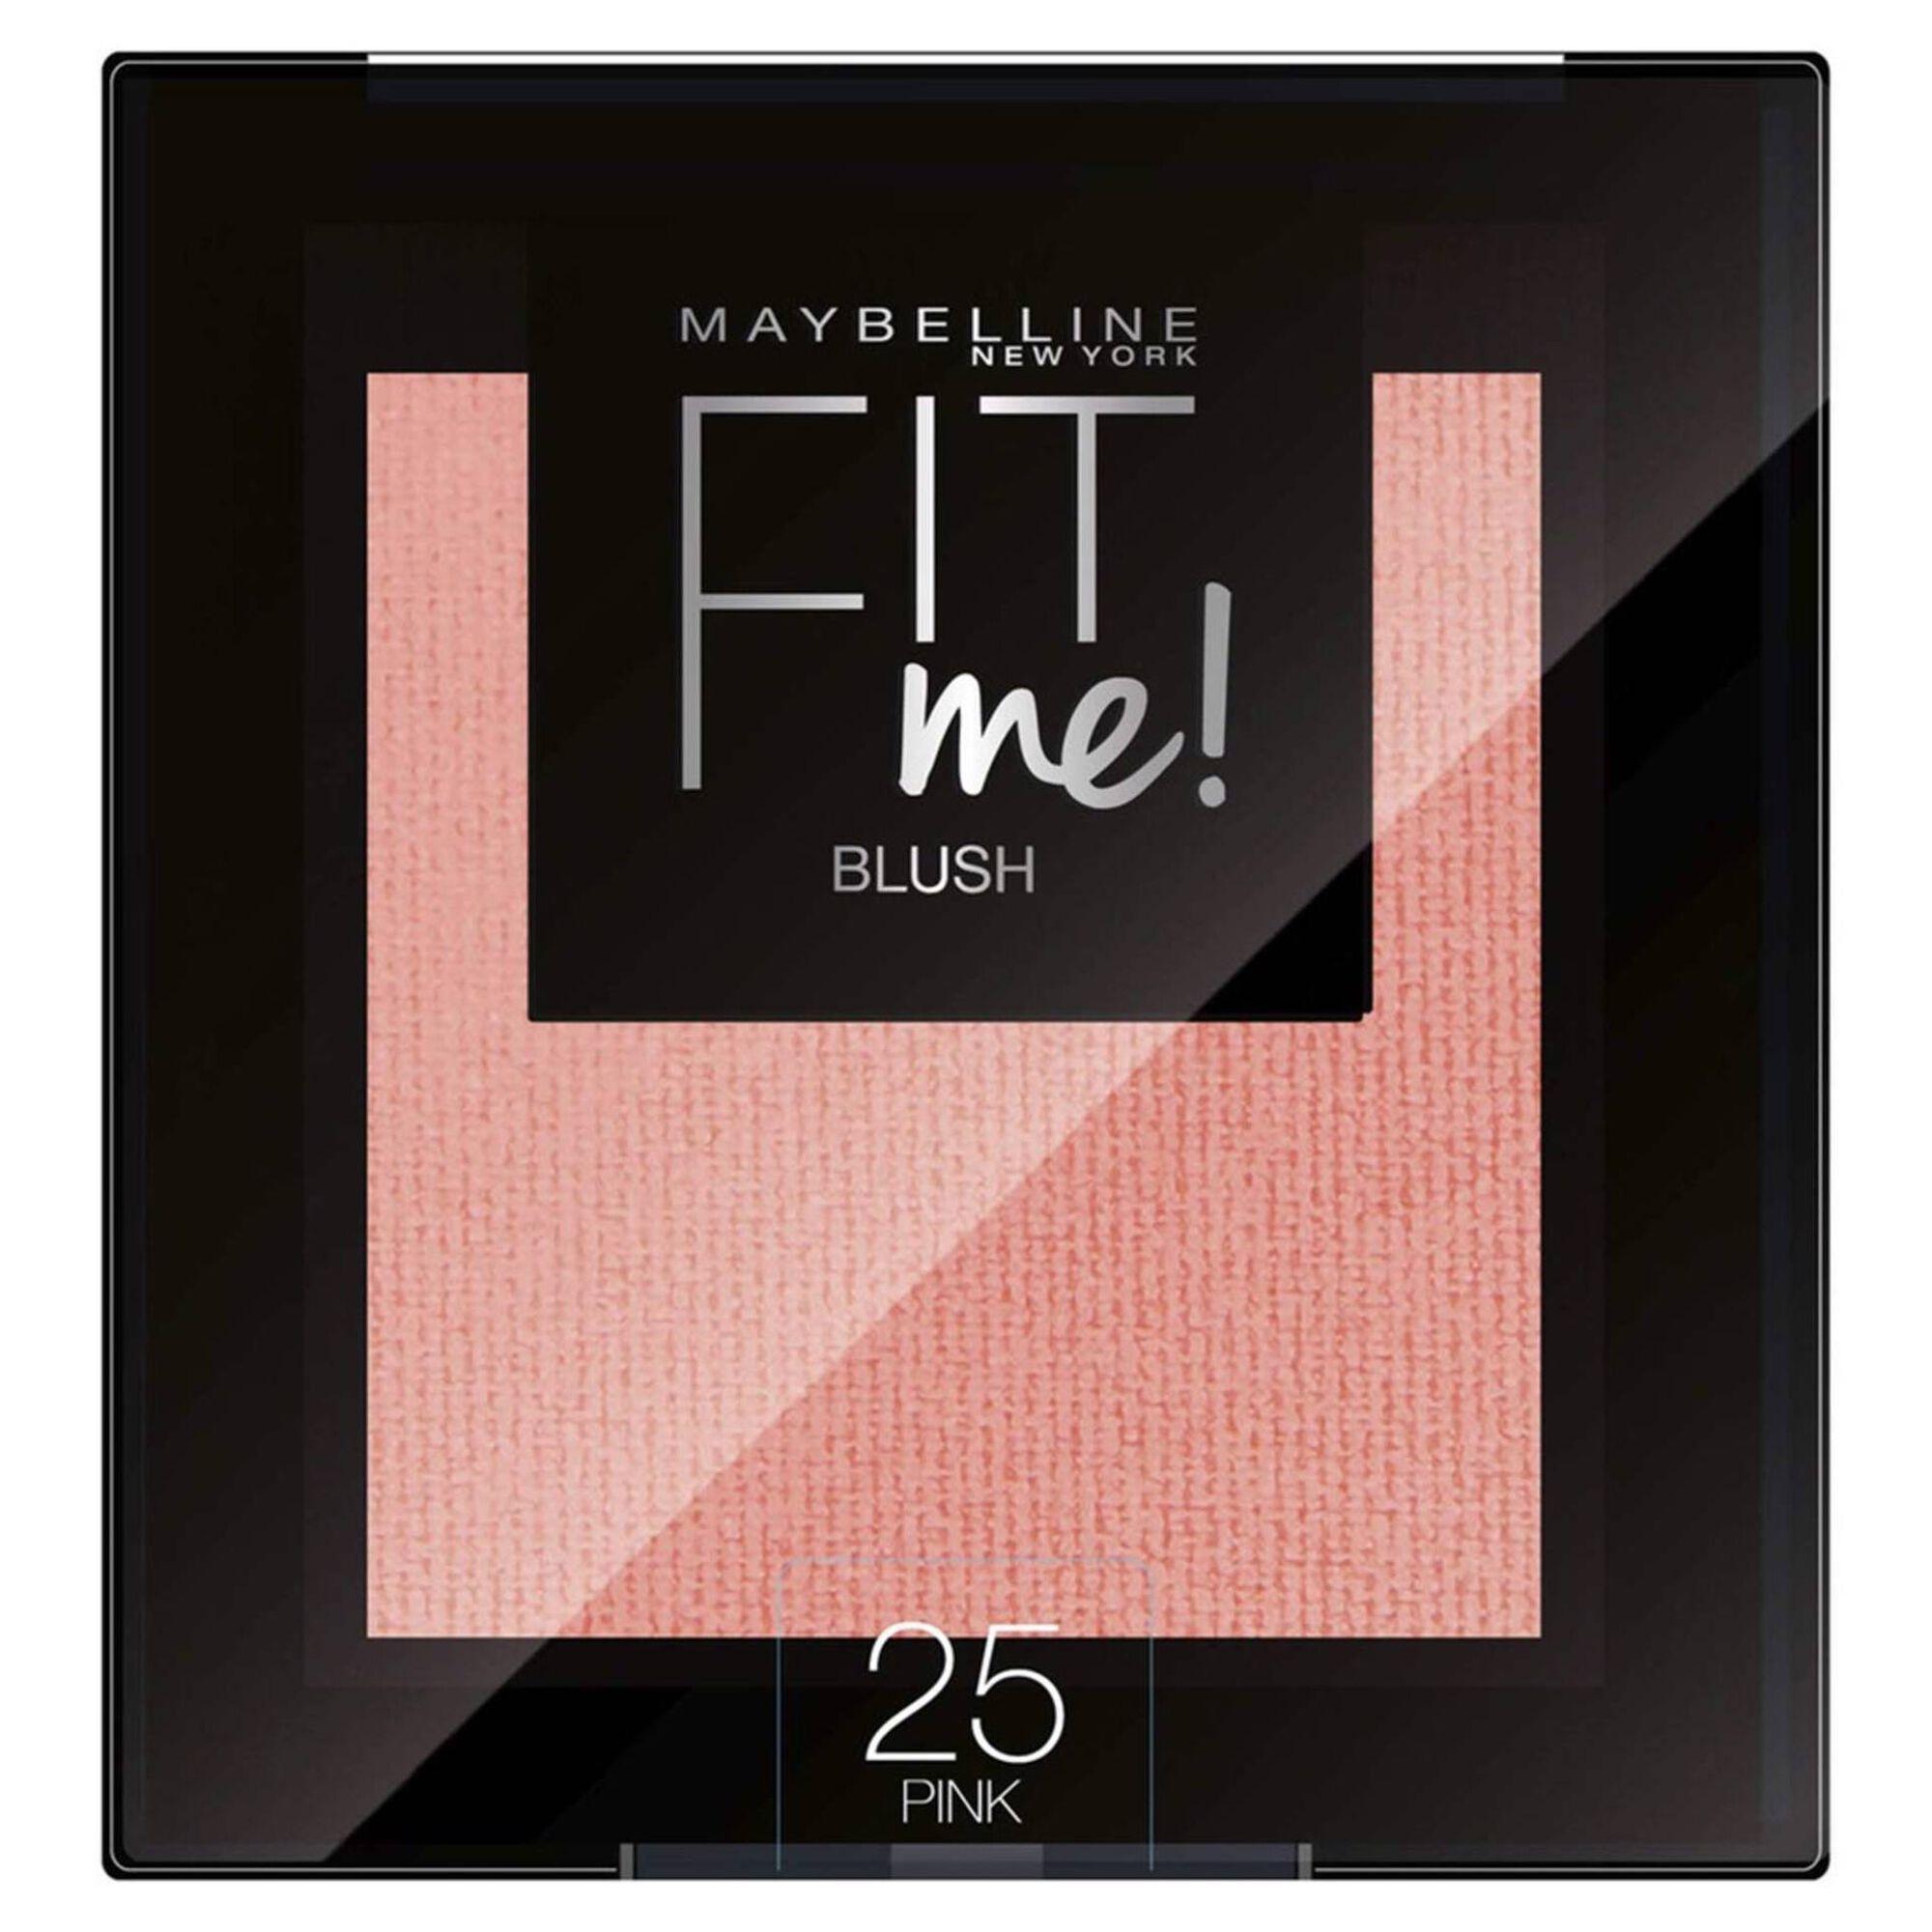 Blush Fit Me Pink 25